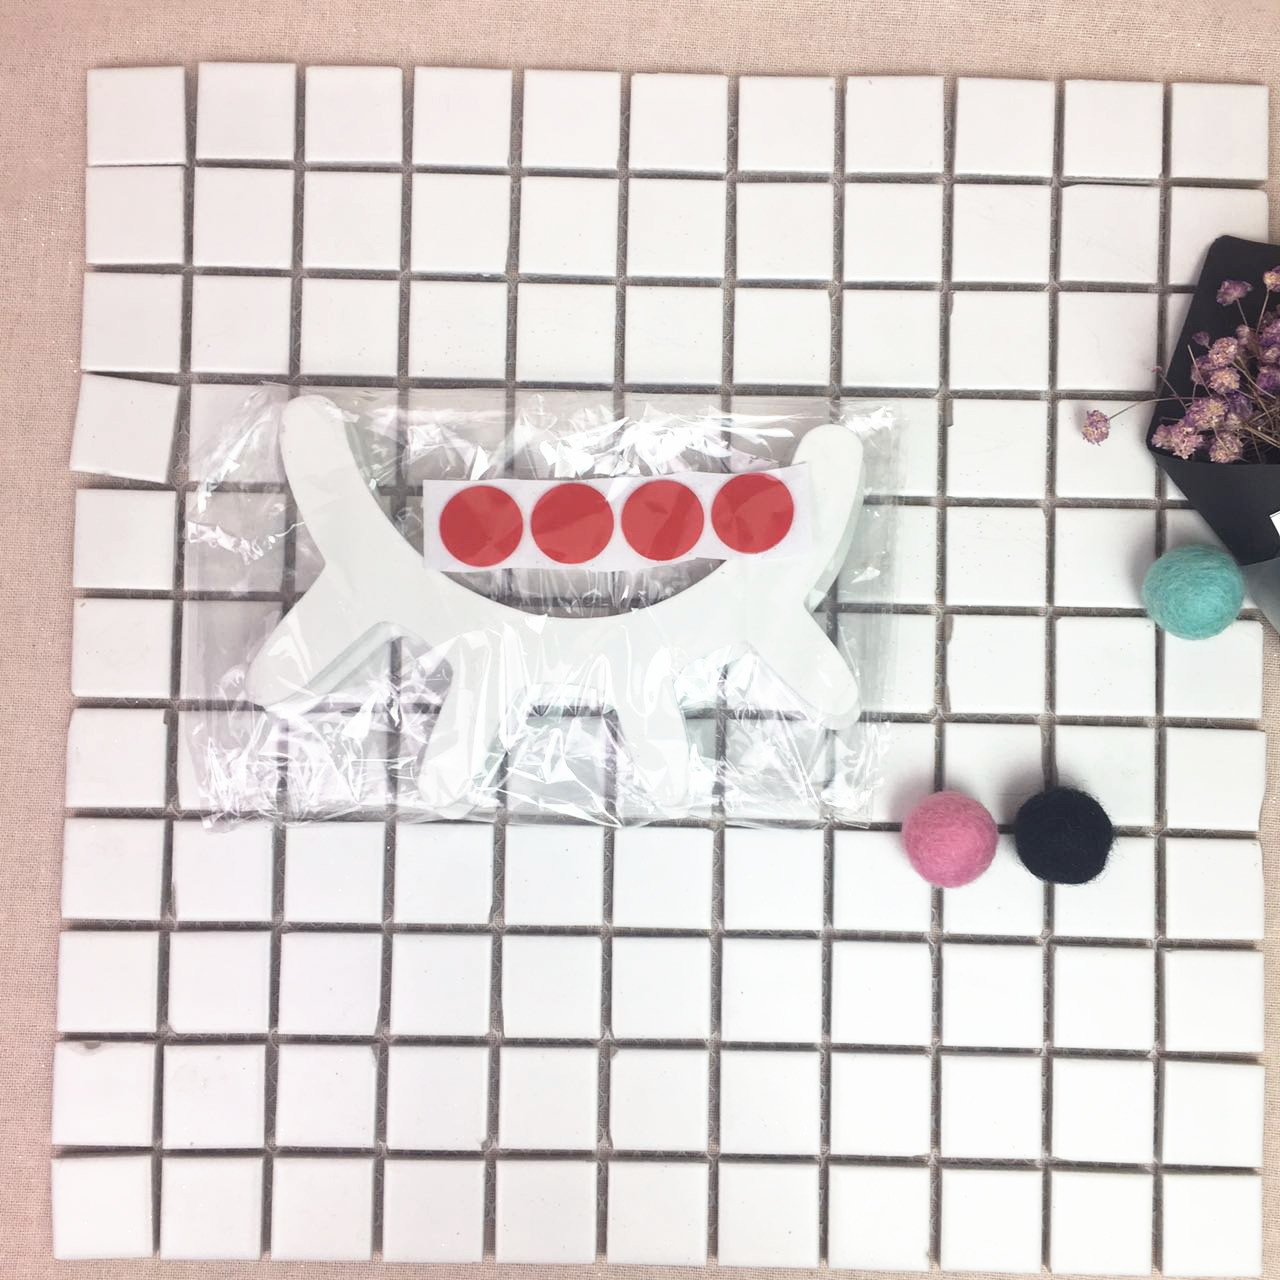 HTB1tS3nRFXXXXc4aXXXq6xXFXXX0 - Urijk 2PCs Ins Nordic Wood Eyelashes Cartoon 3D Wall Sticker DIY Children Bedroom Props Home Living Room Decoration 15*11cm